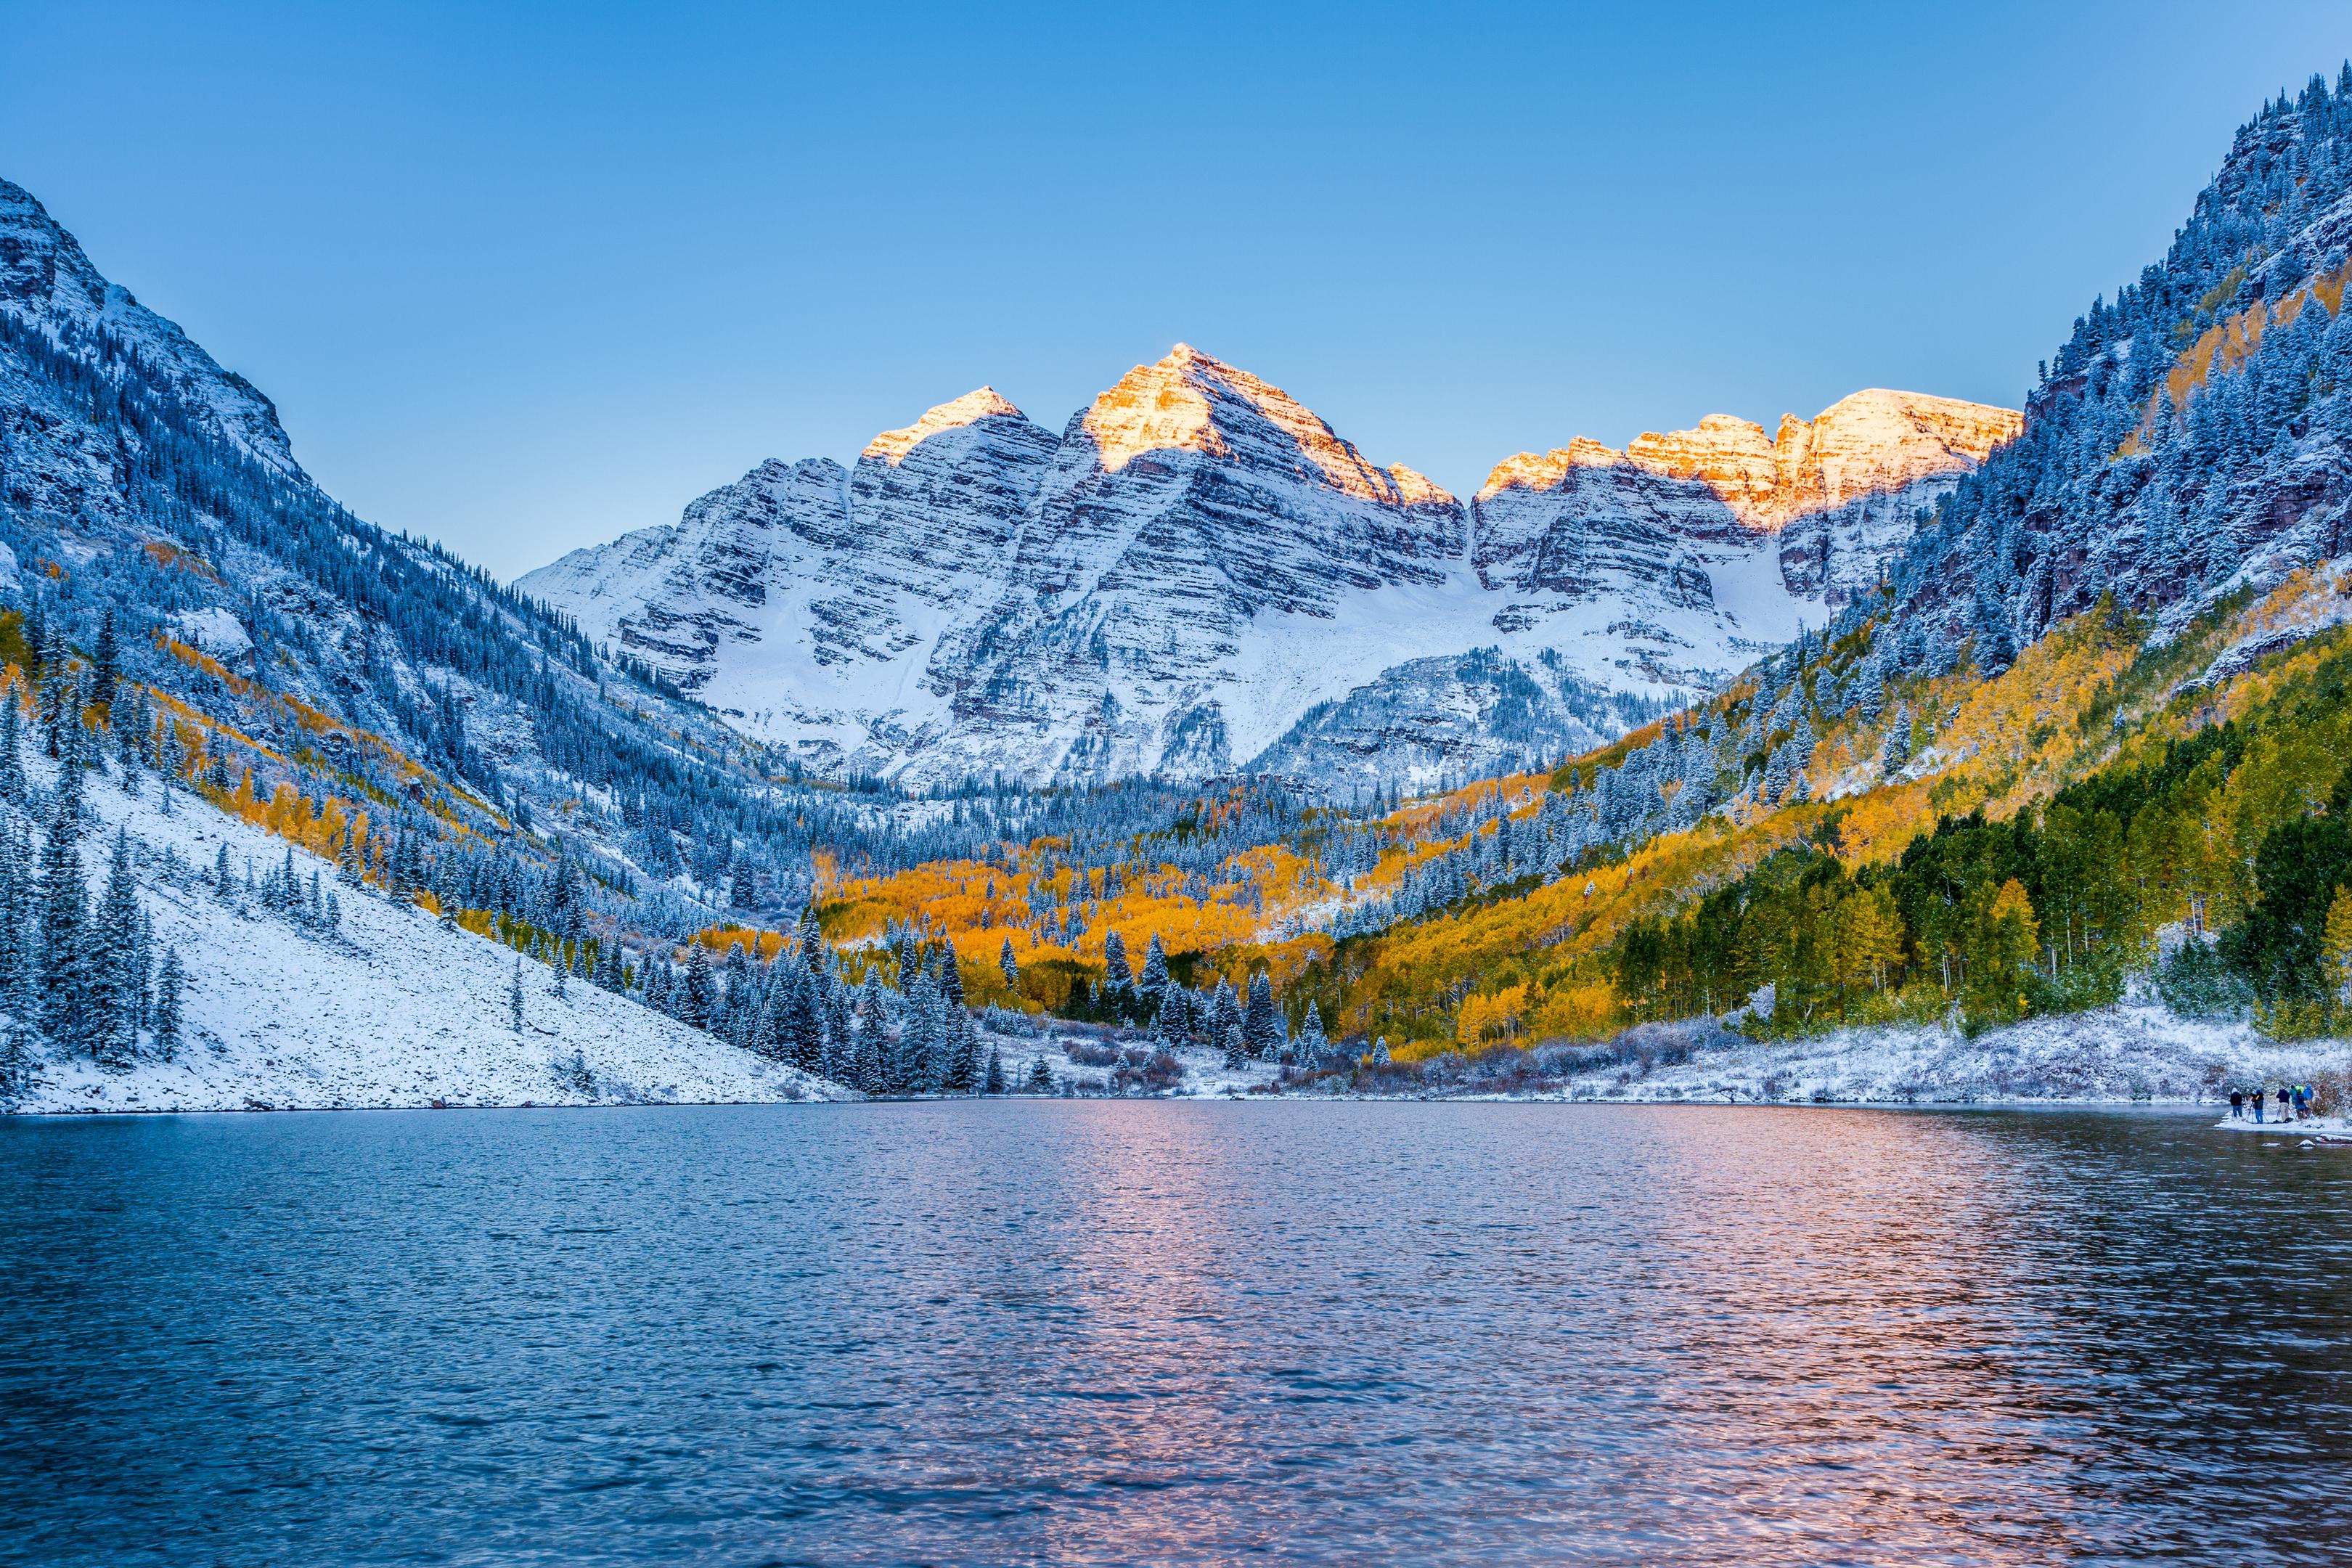 Maroon bells at sunrise, Aspen (Getty)